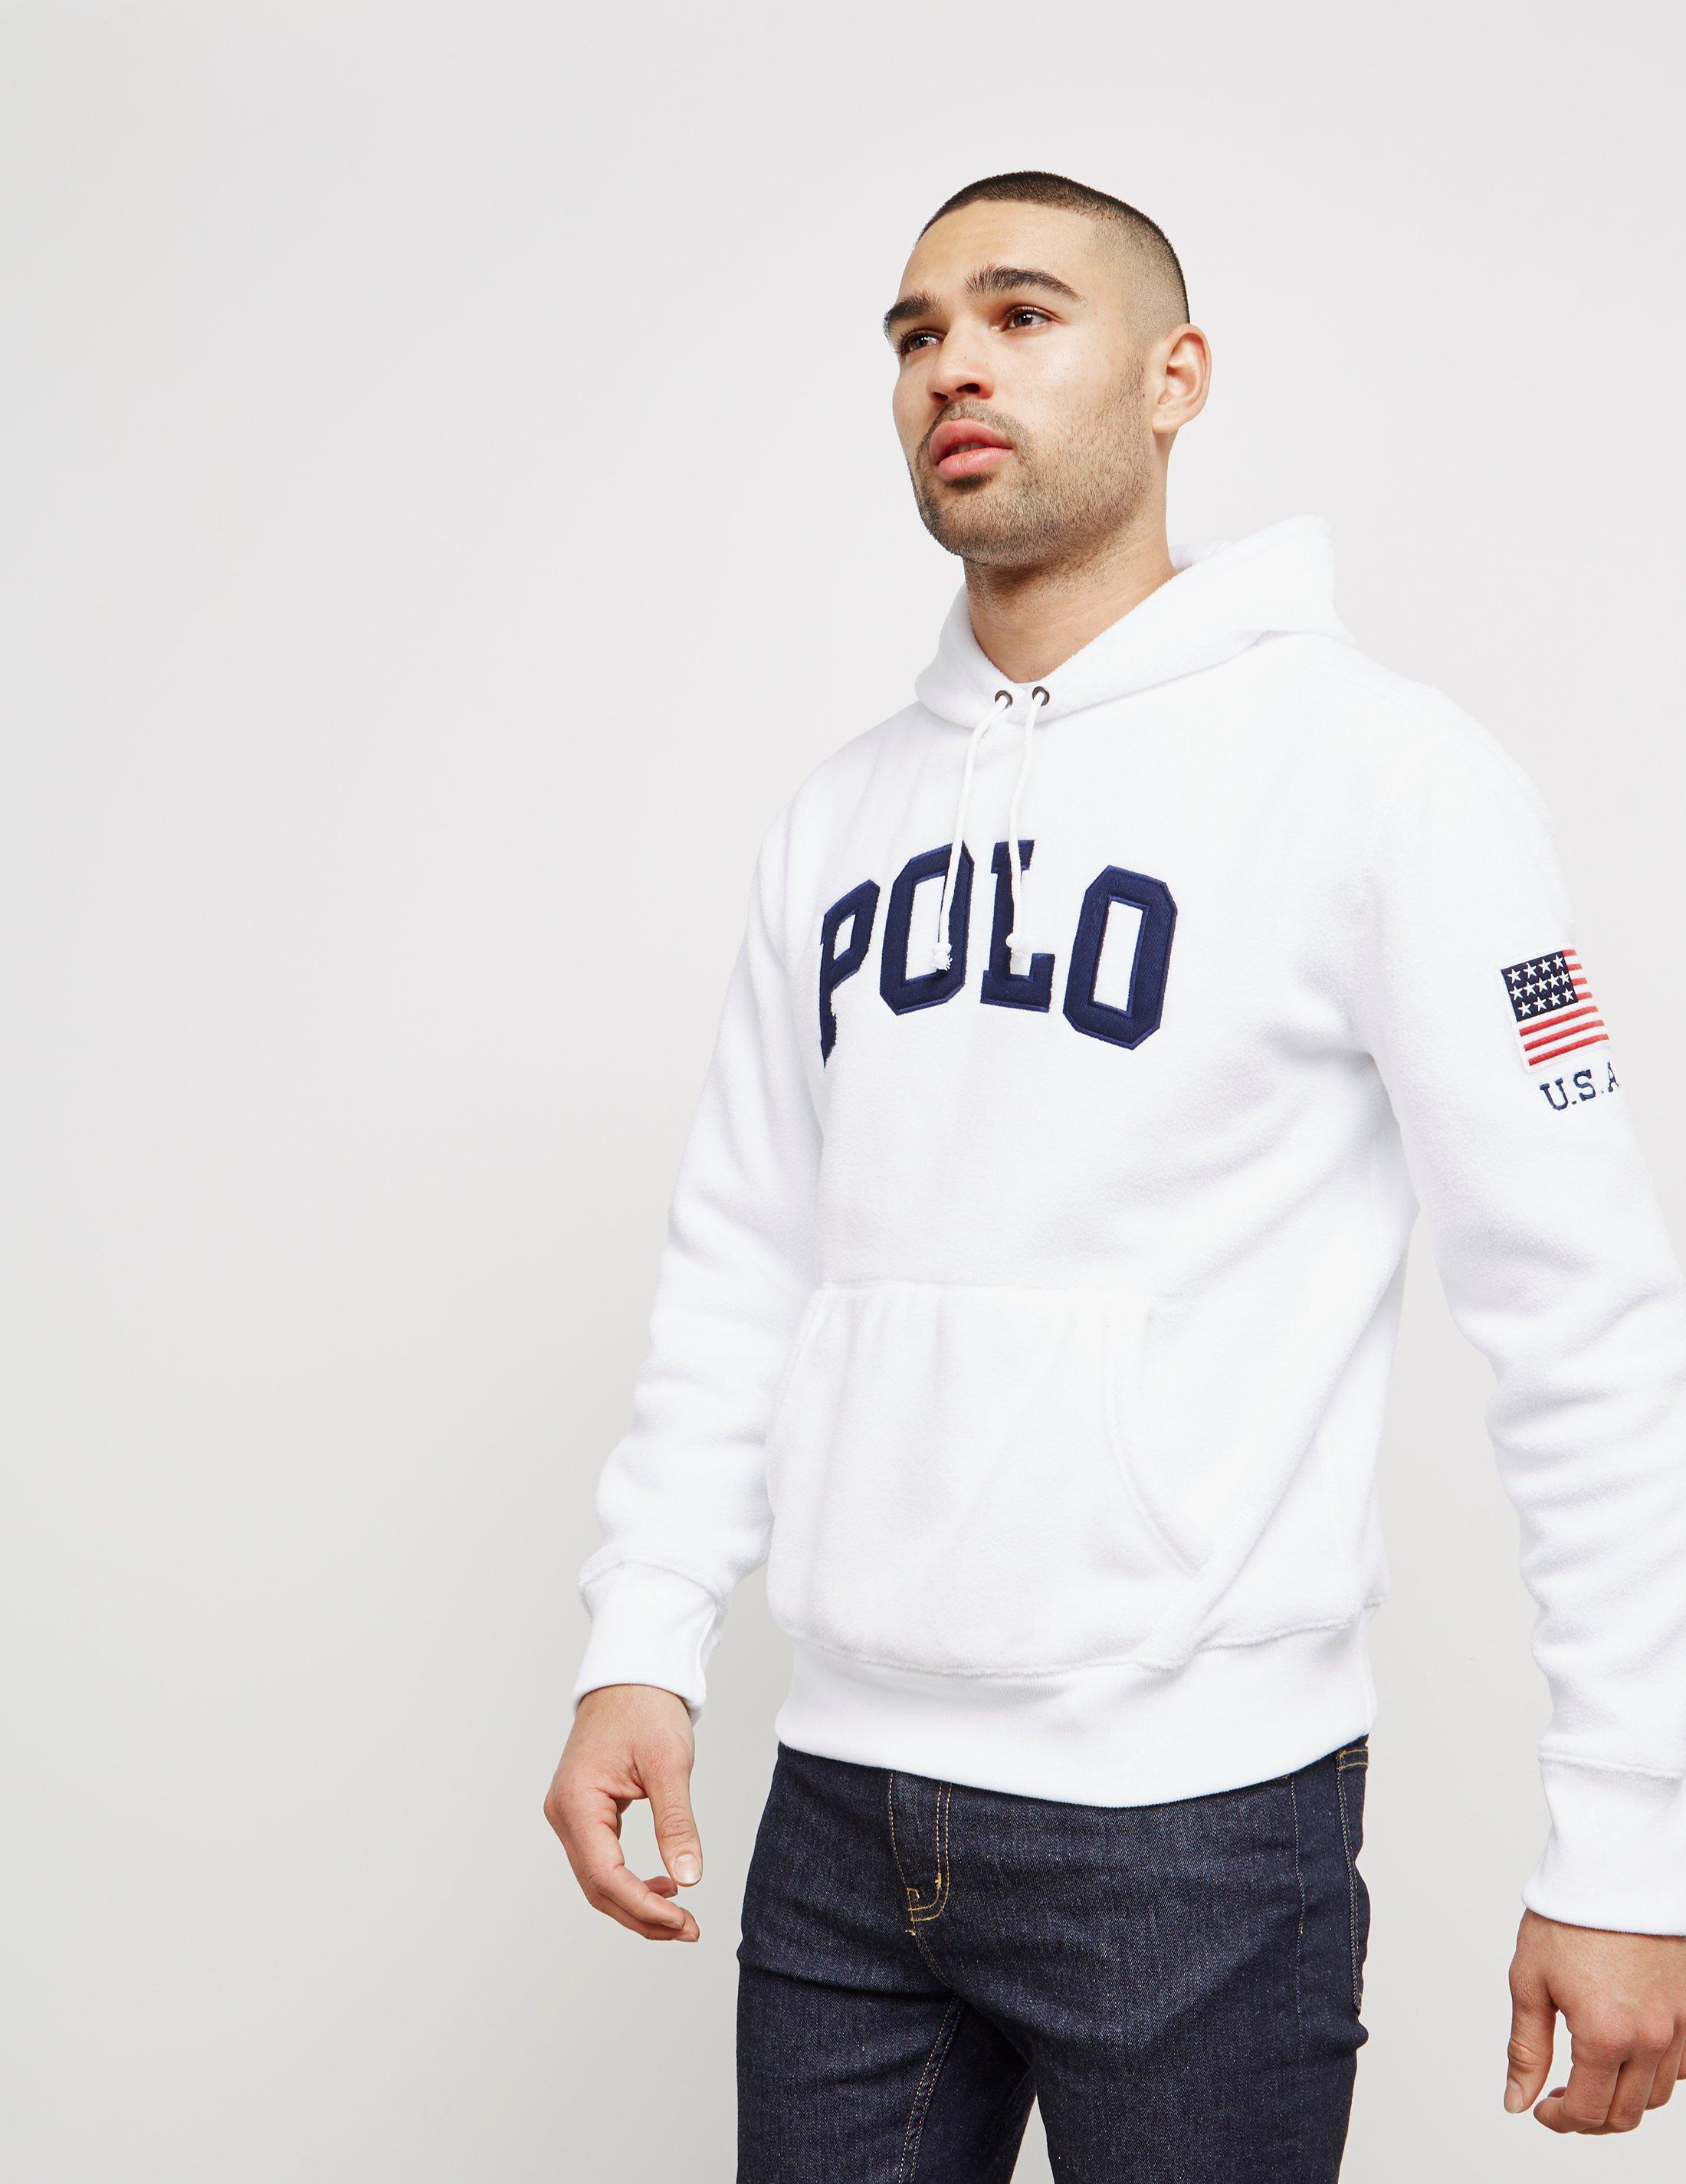 8828e0e5555b Lyst - Polo Ralph Lauren Mens Vintage Fleece Overhead Hoodie White ...